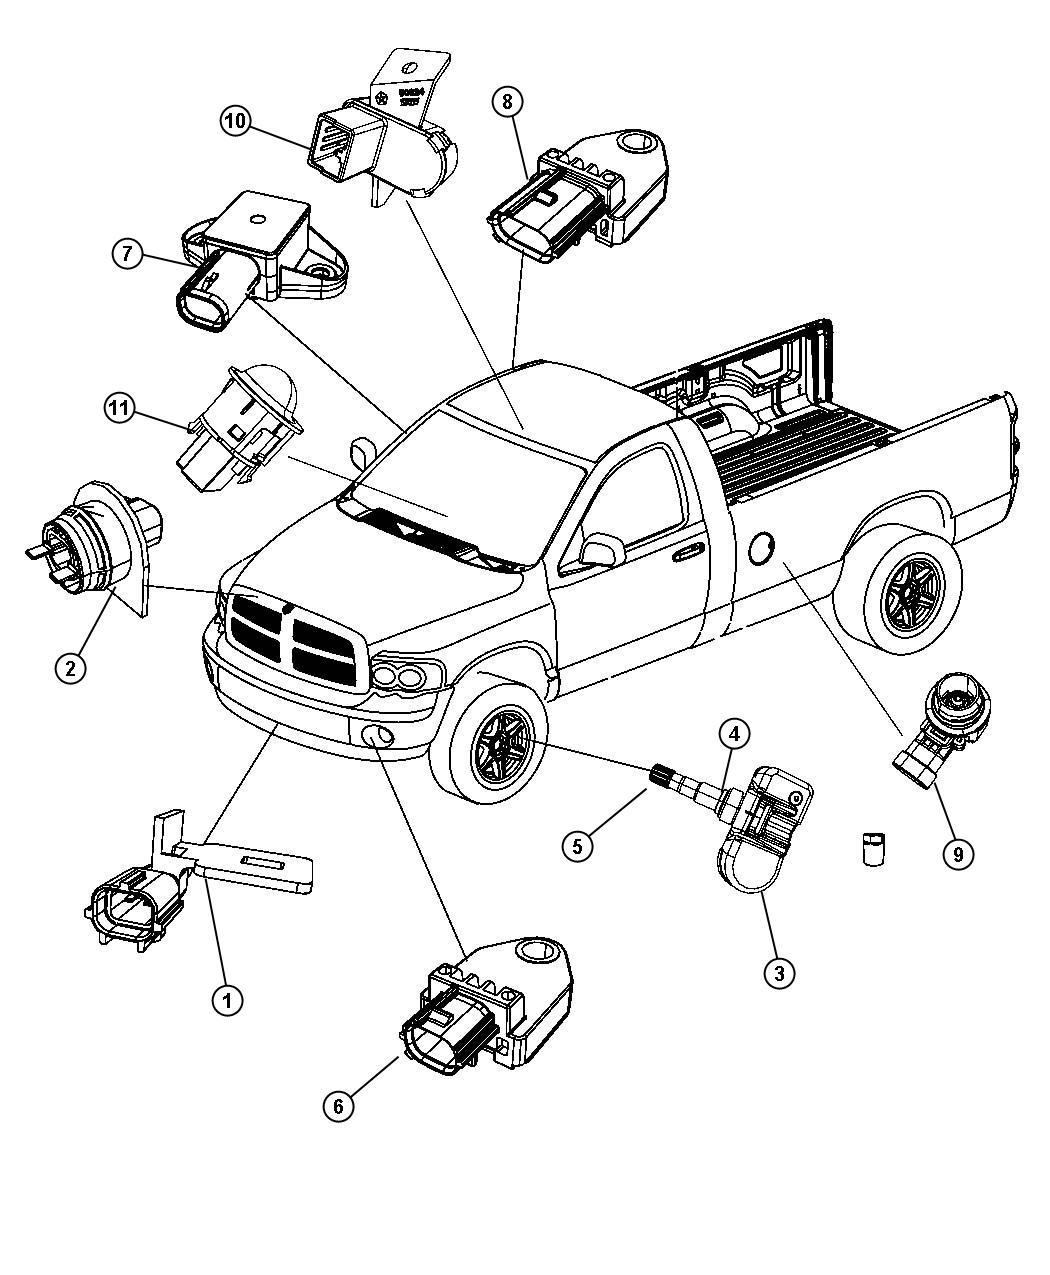 2011 Jeep Liberty Sensor. Infrared. Trim: (*o0.). Rear